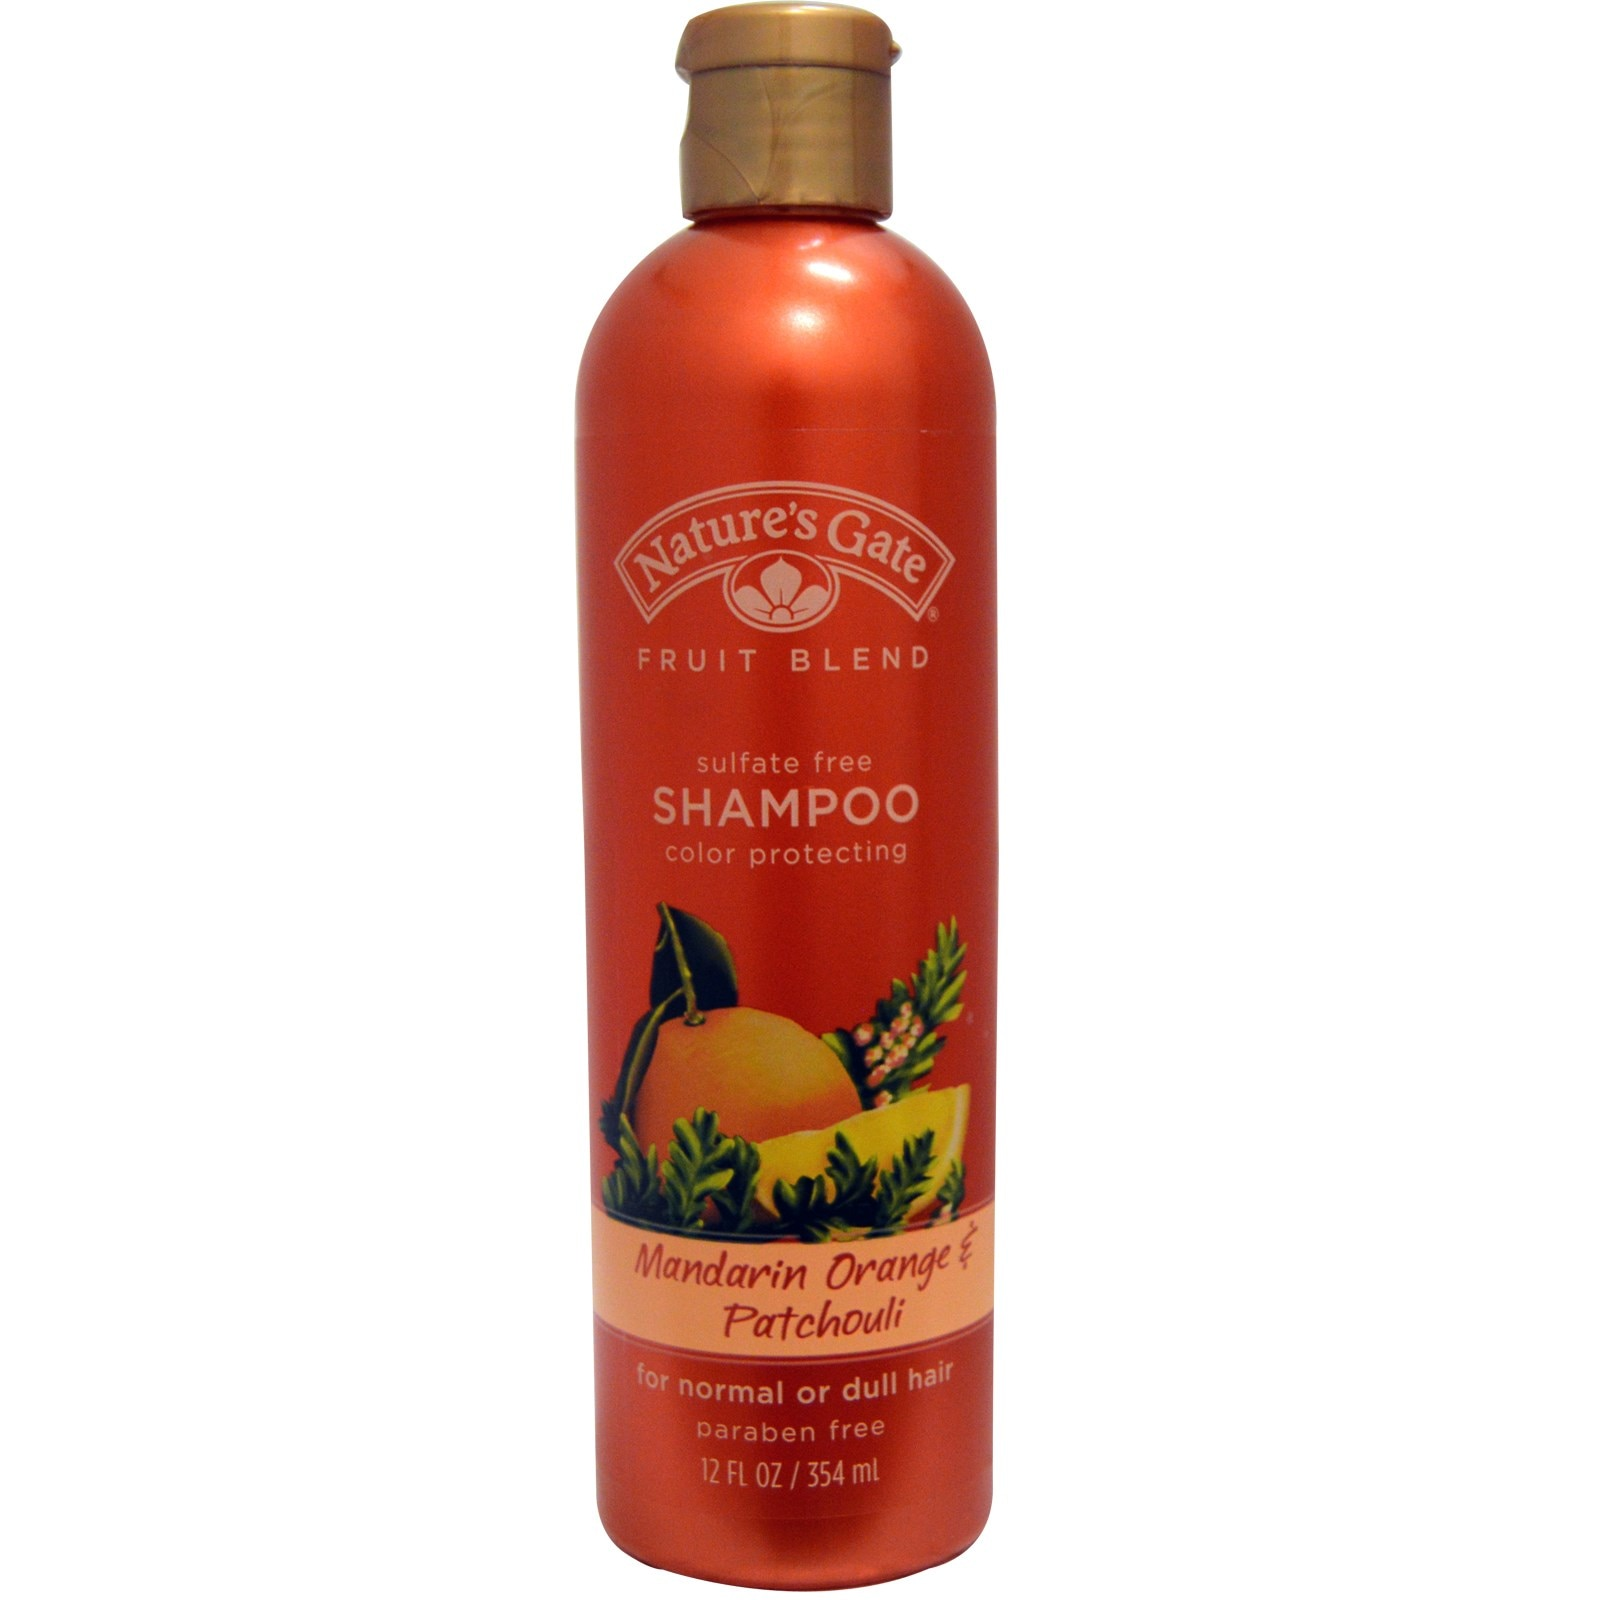 Mandarin Orange and Patchouli Fruit Organic Image